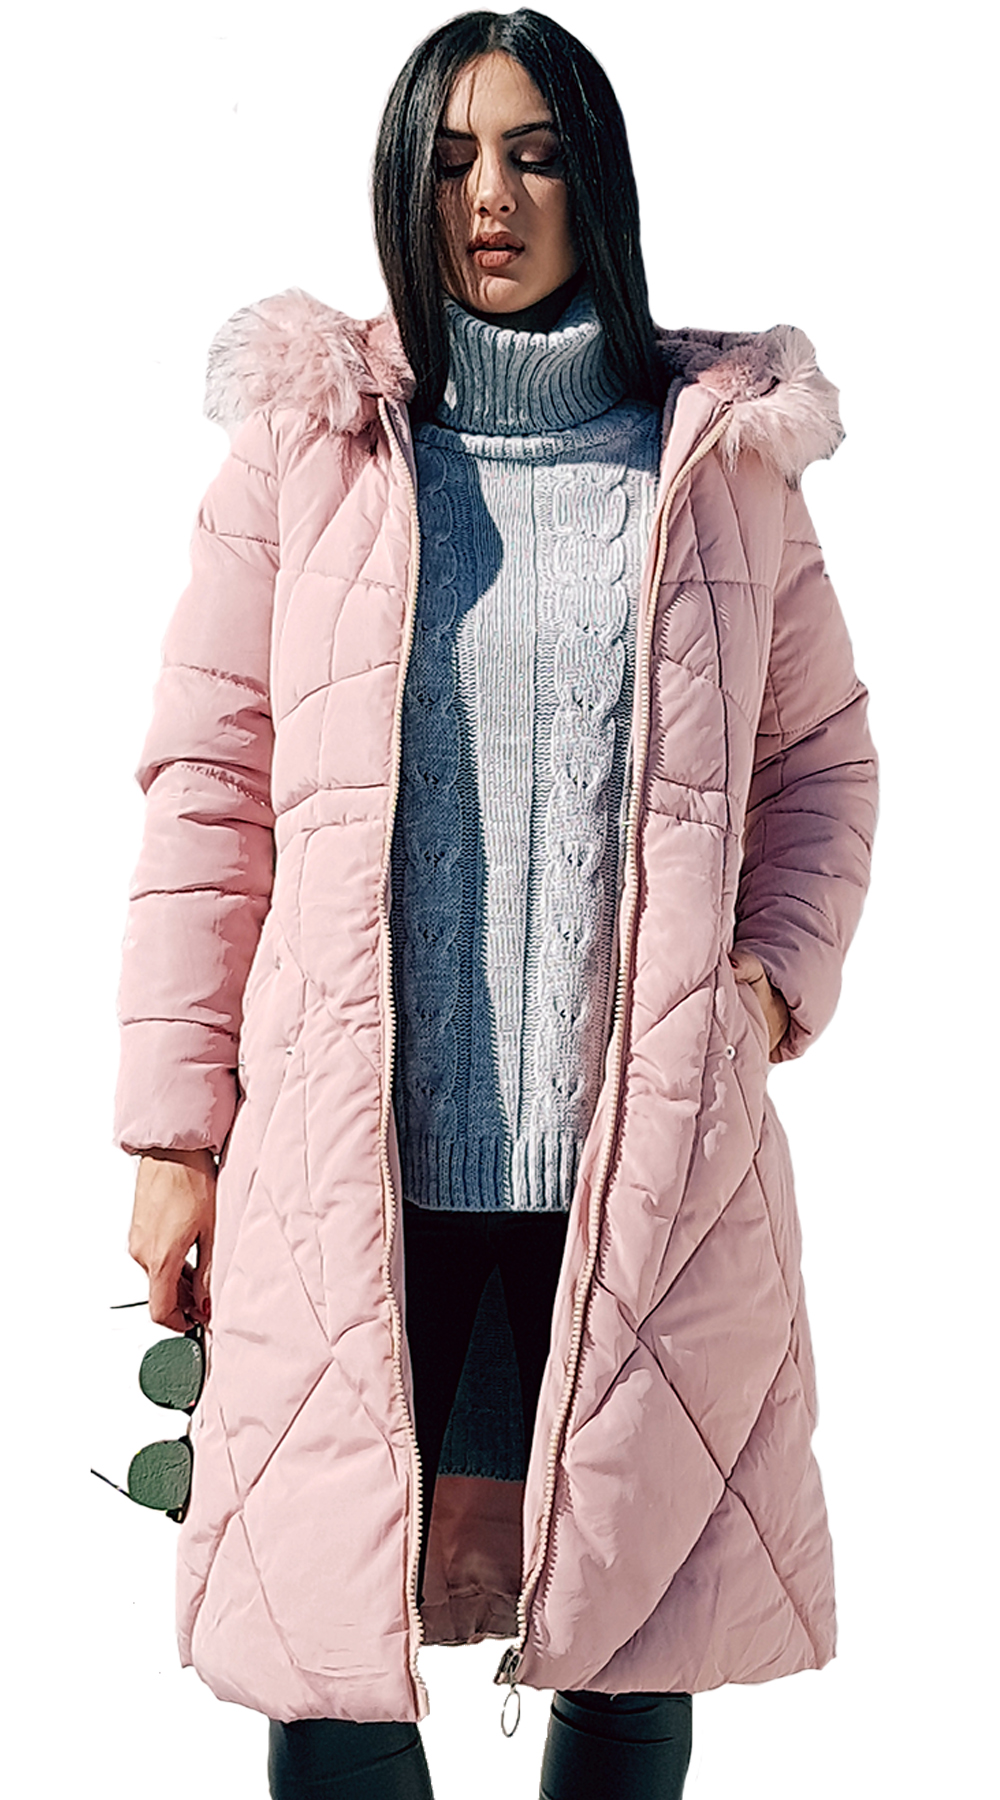 Missreina Ζεστό Καπιτονέ Μακρύ Μπουφάν με τσέπες και κουκούλα - MissReina -  W18MR-46403 3410868185f